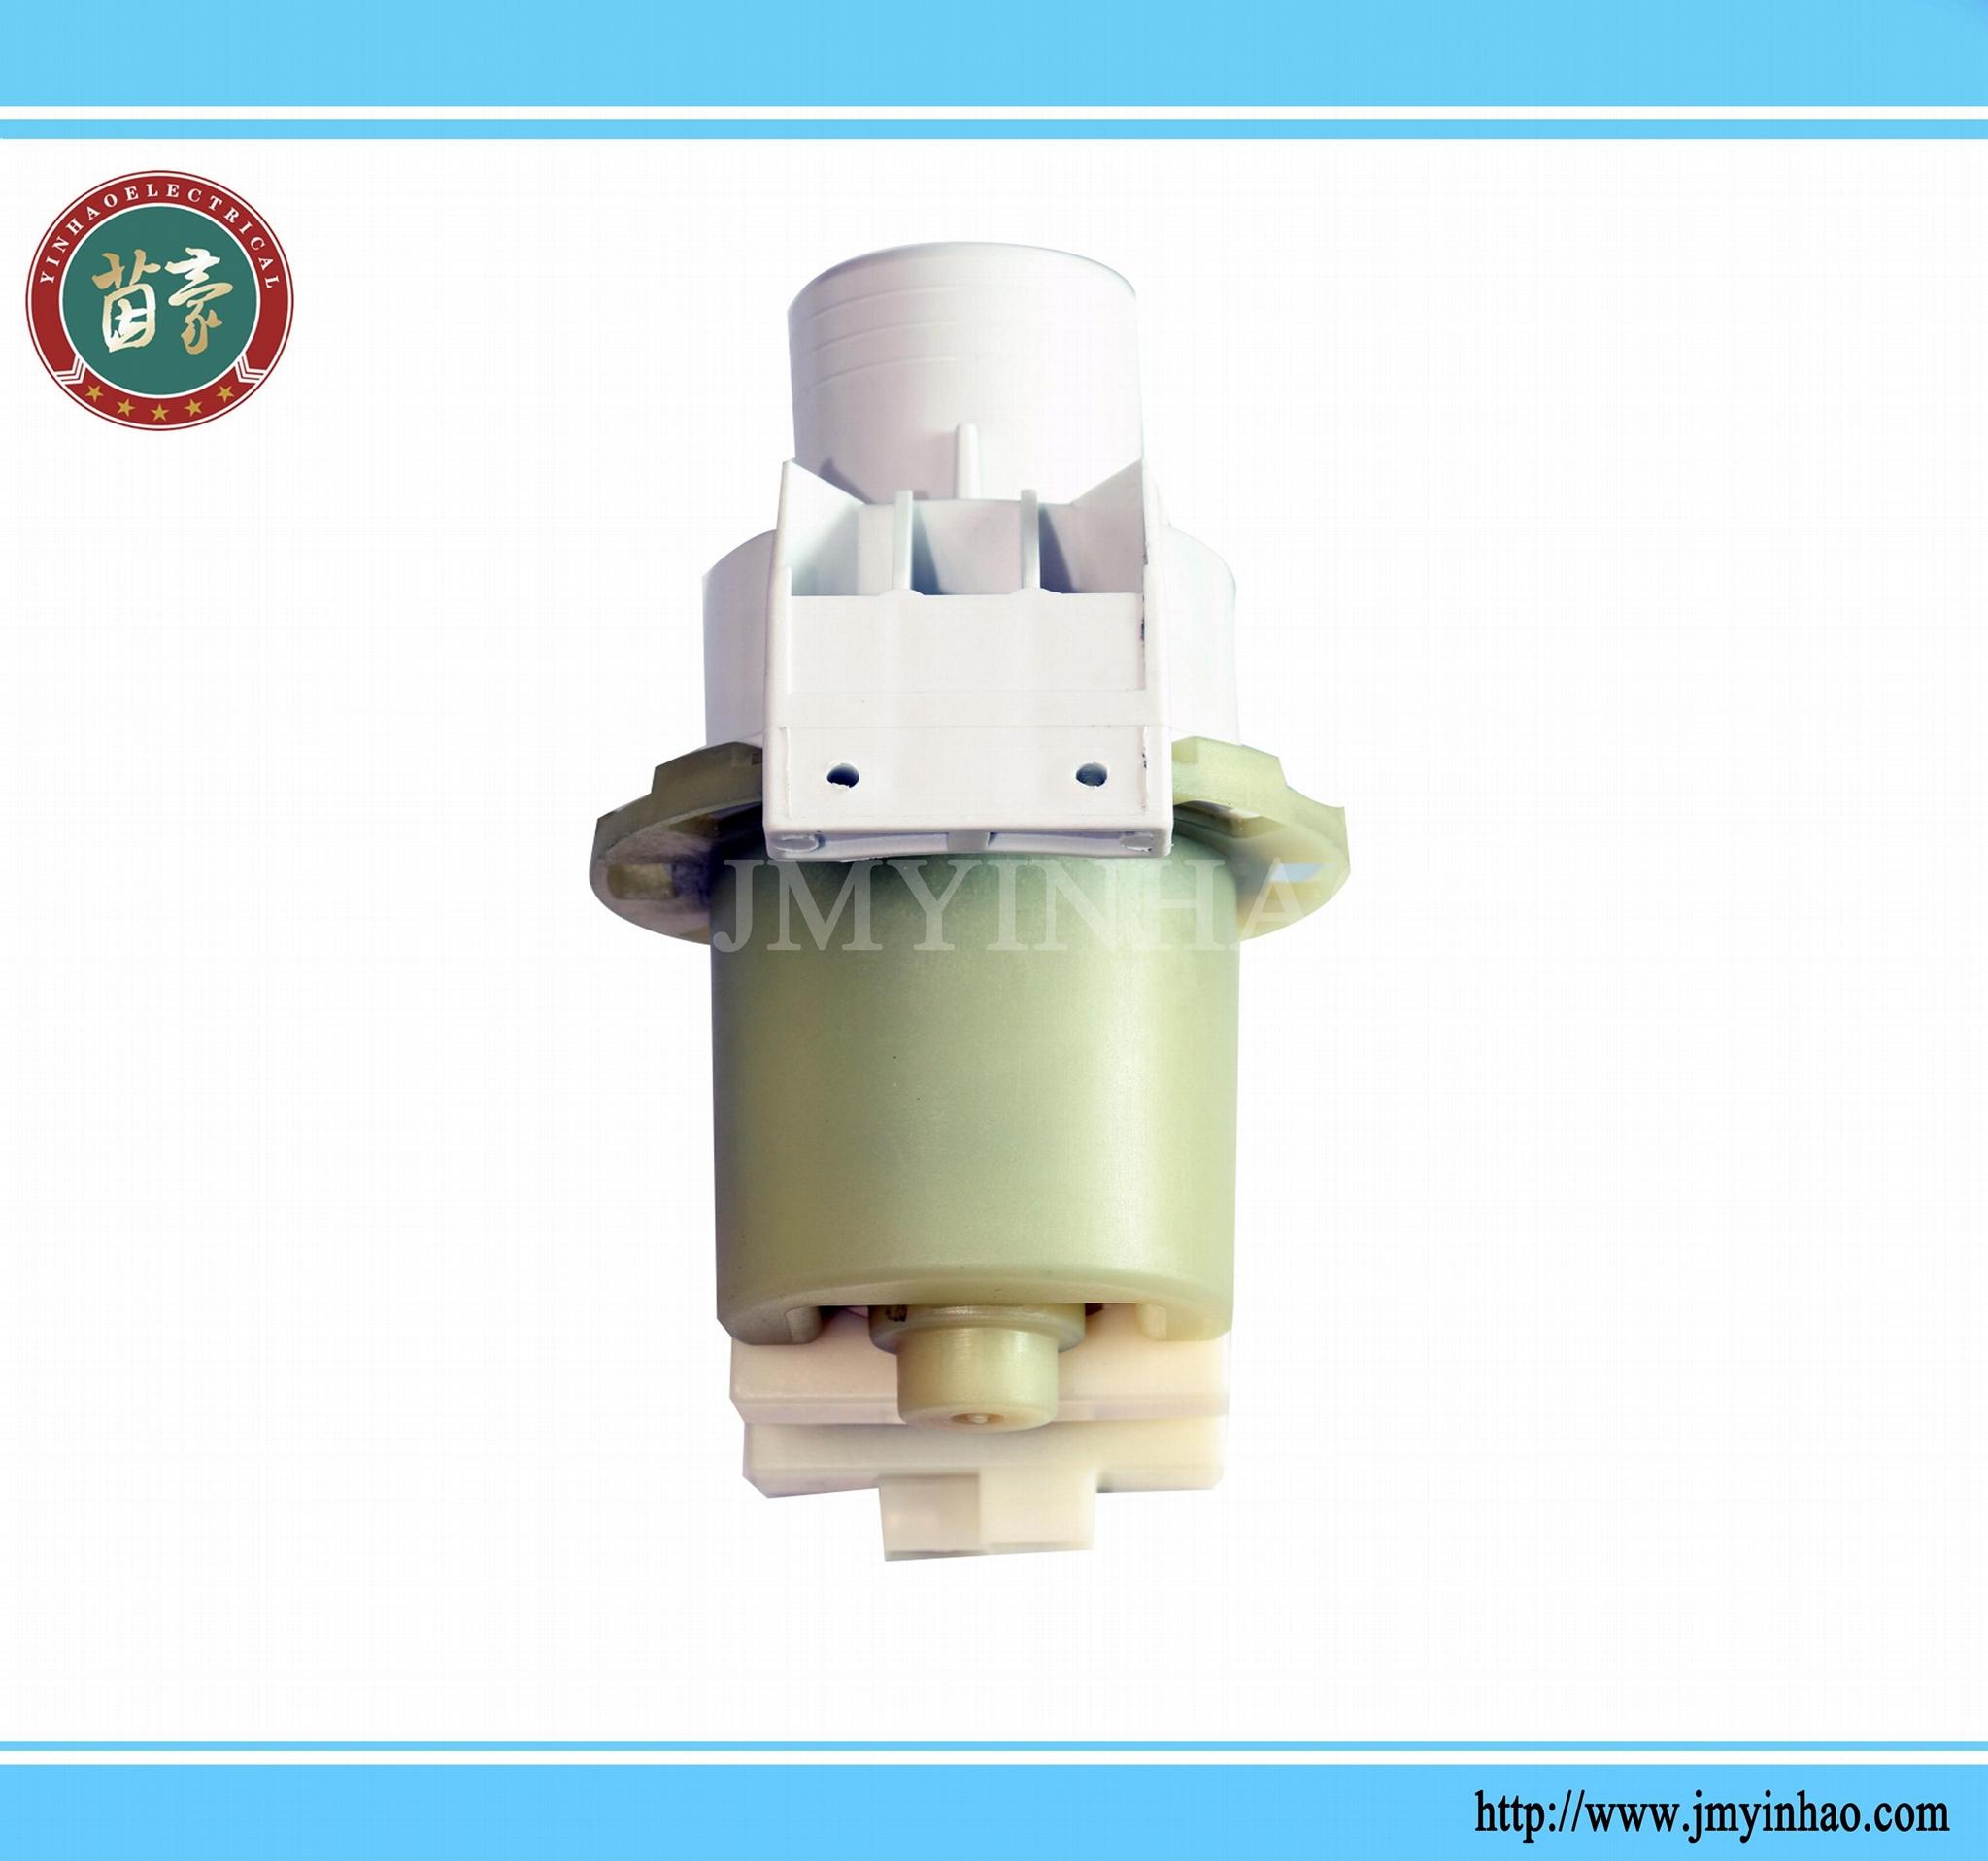 Washing Machine Water Pump Washer Drain pump For Whirlpool Parts W10130913 3